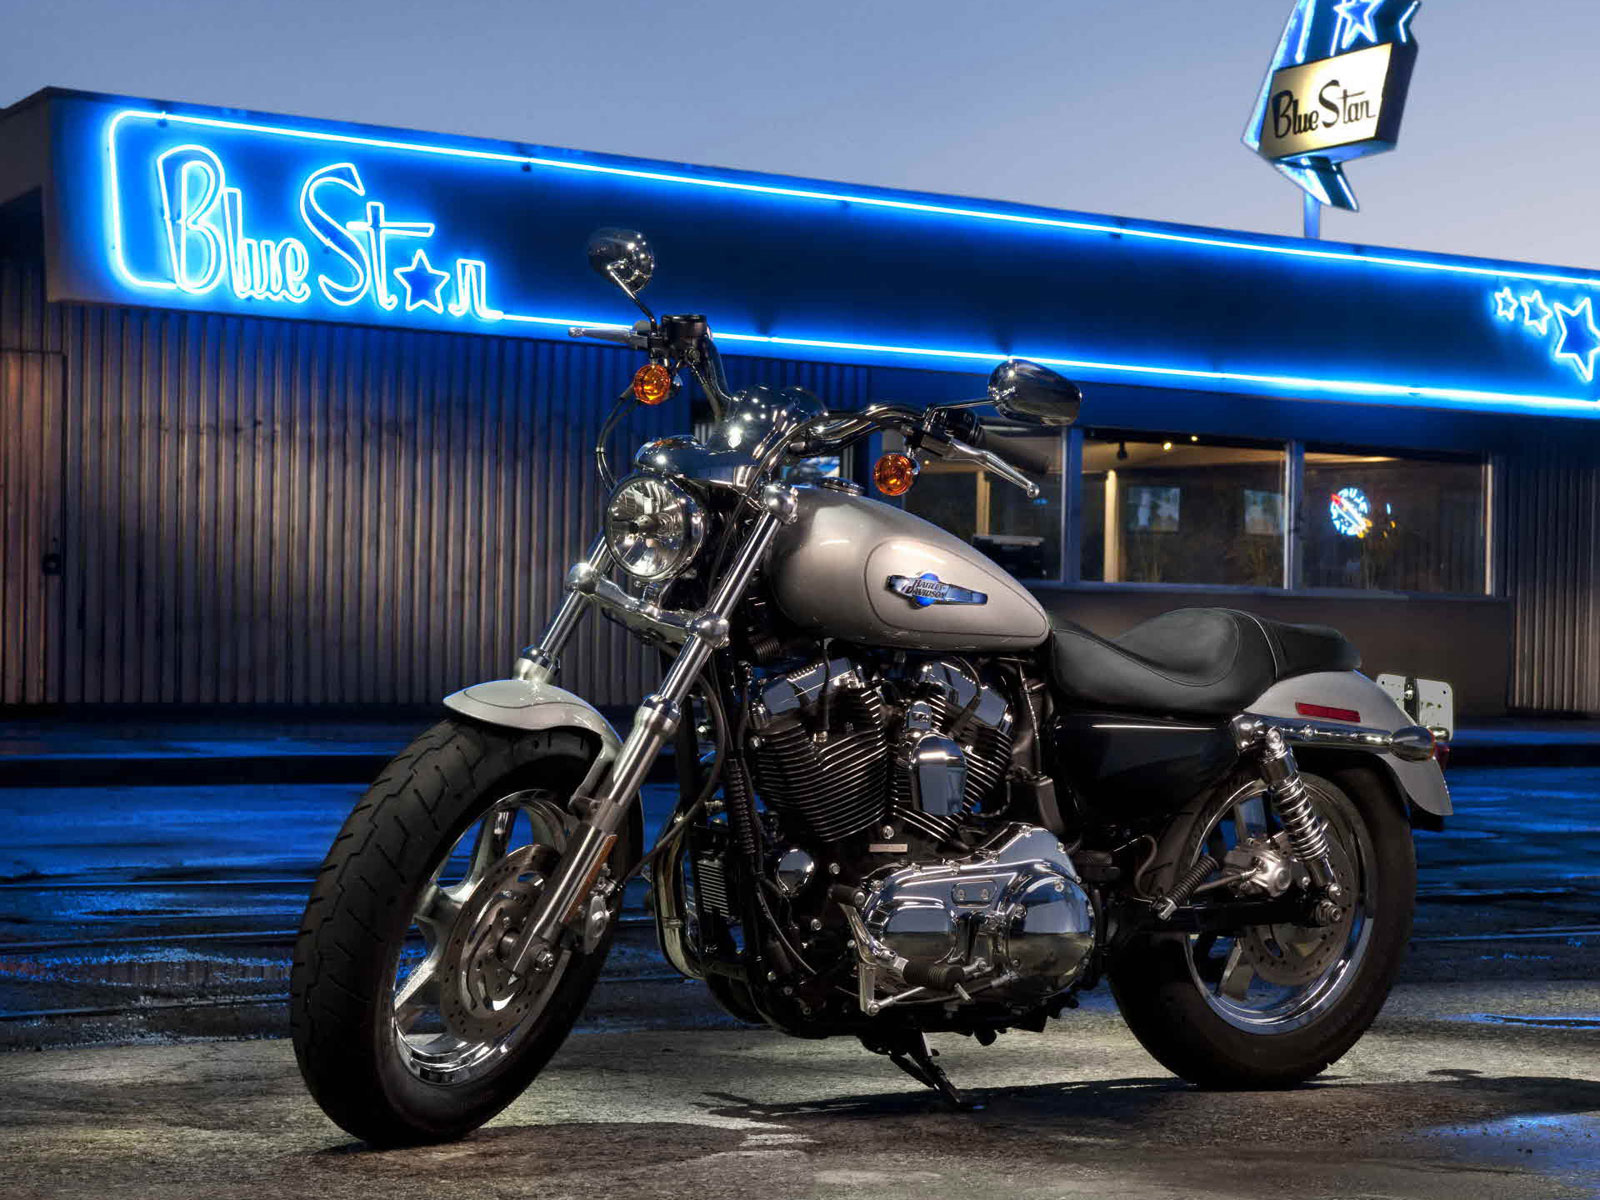 2012 Harley-Davidson XL1200C Sportster 1200 Custom